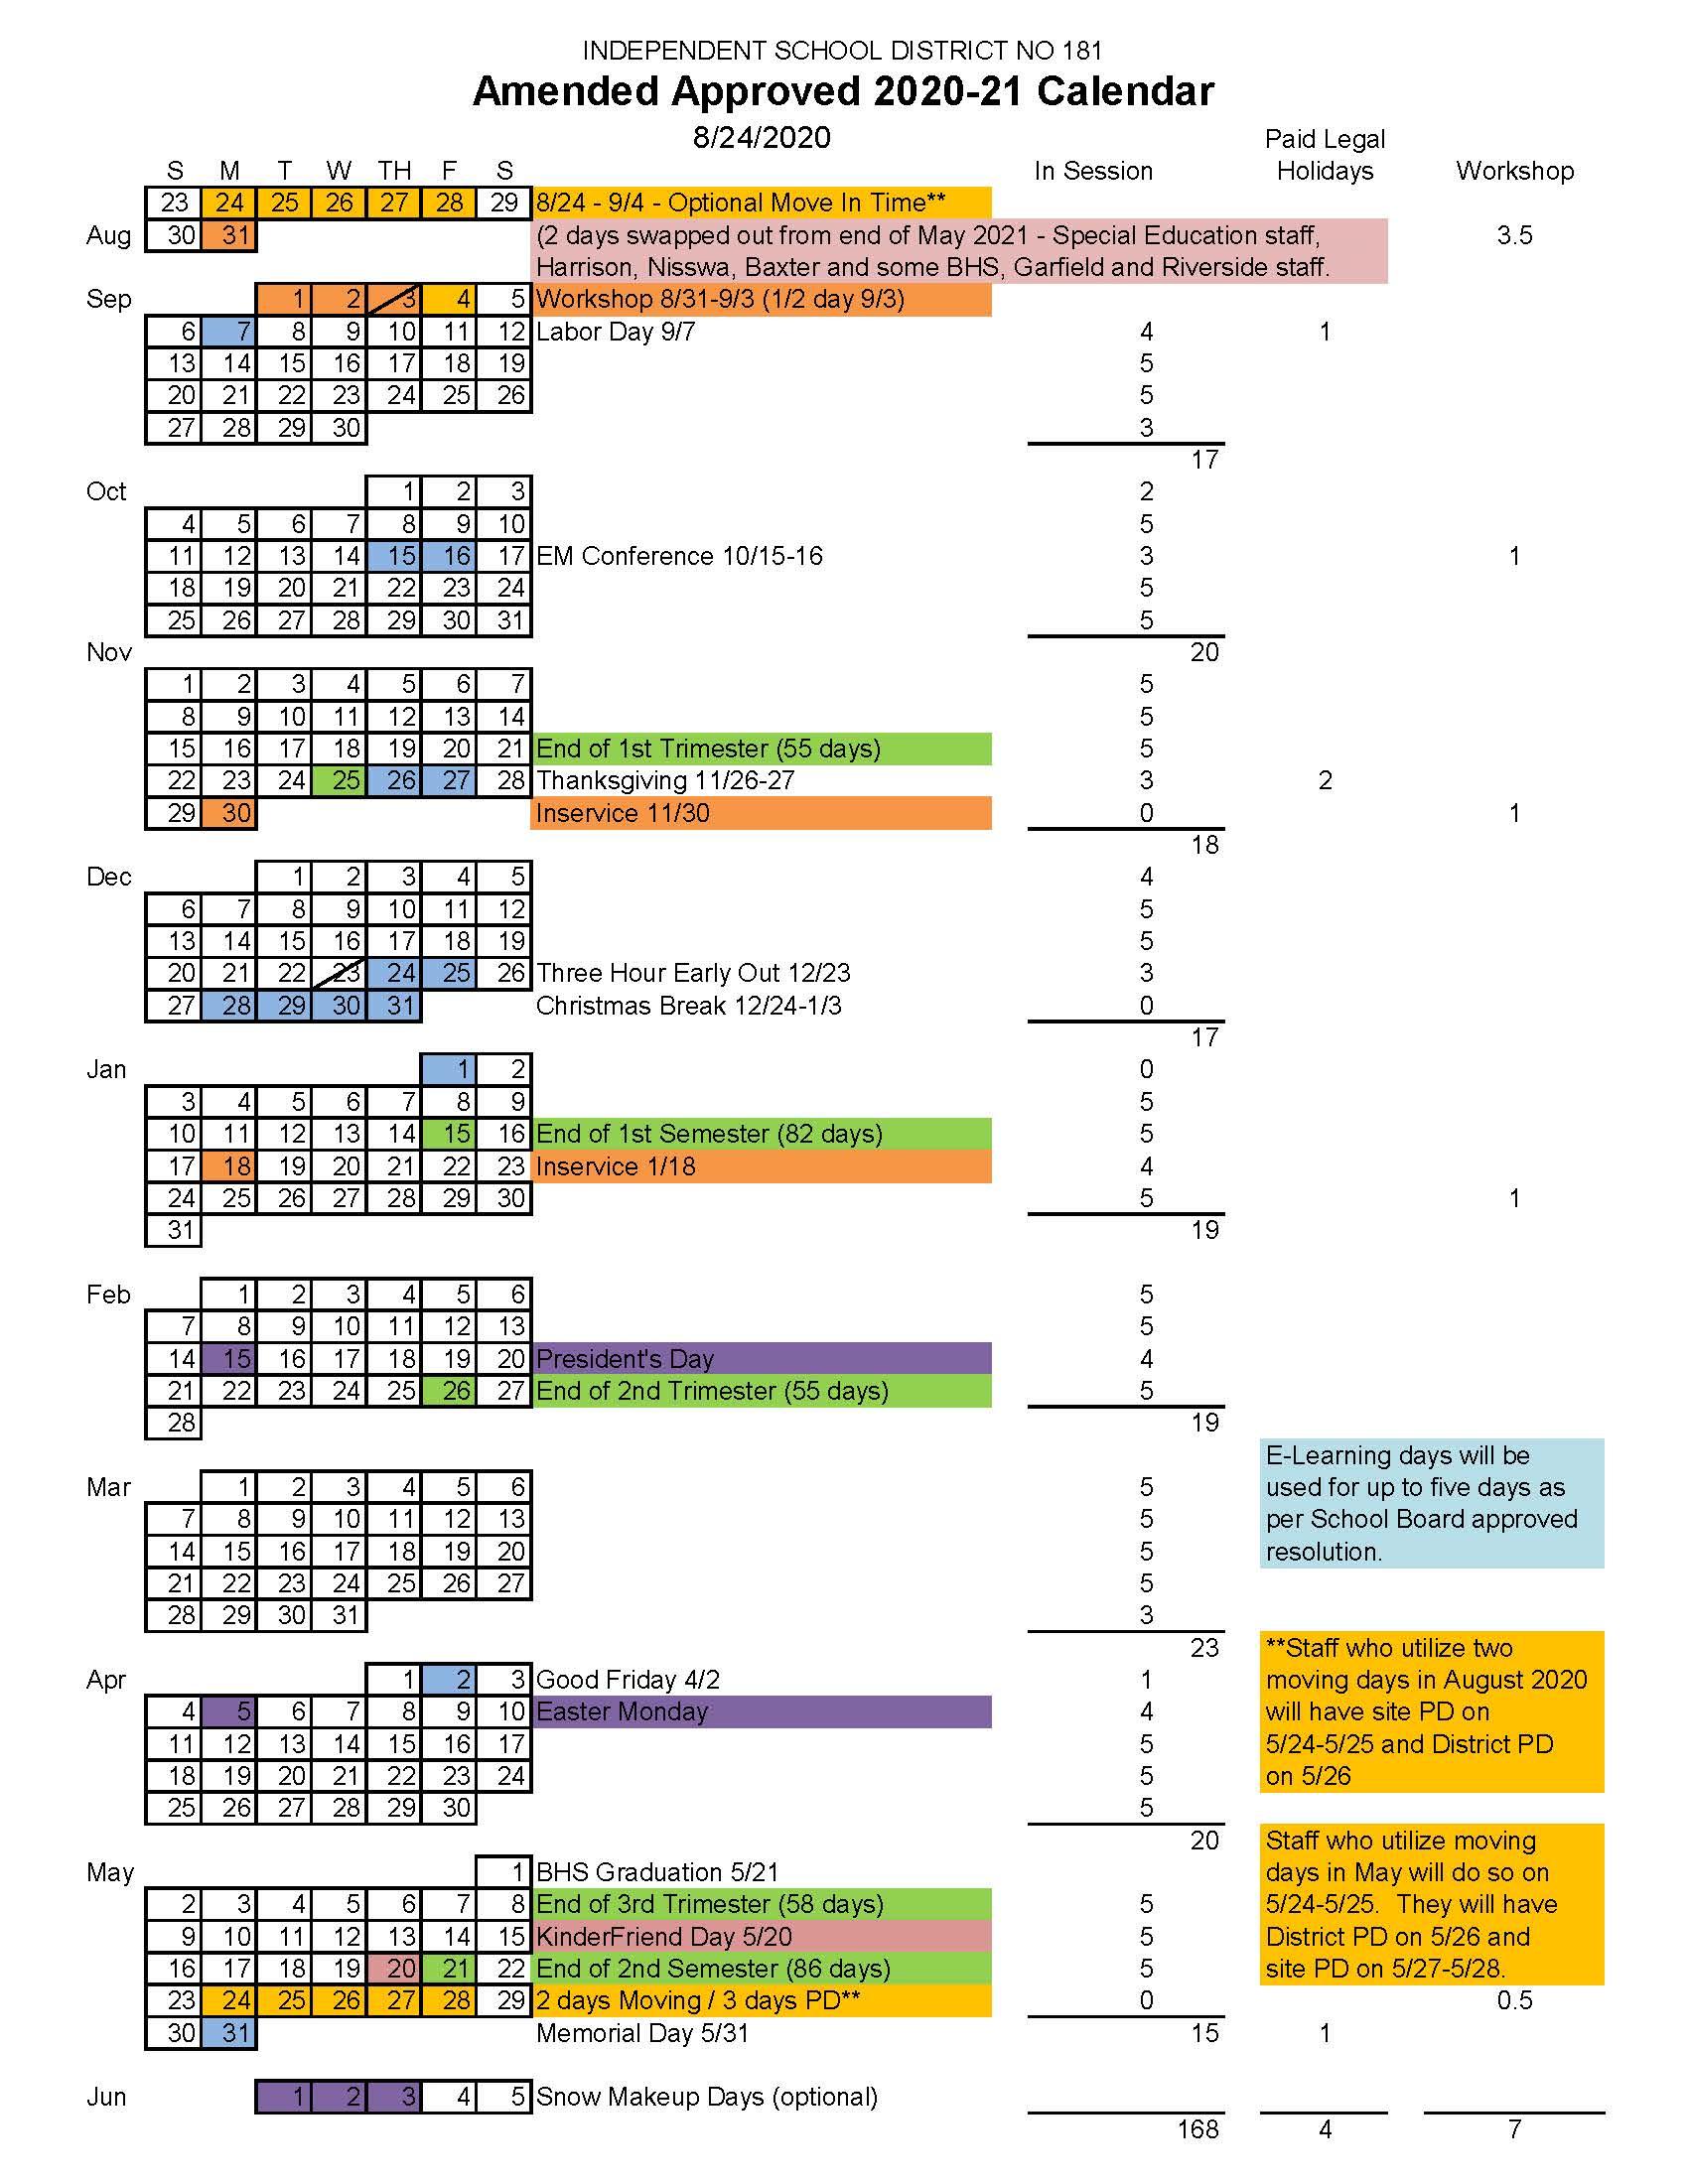 Approved 2020-21 Calendar - Brainerd Public Schools with regard to 454 2021 Calendar